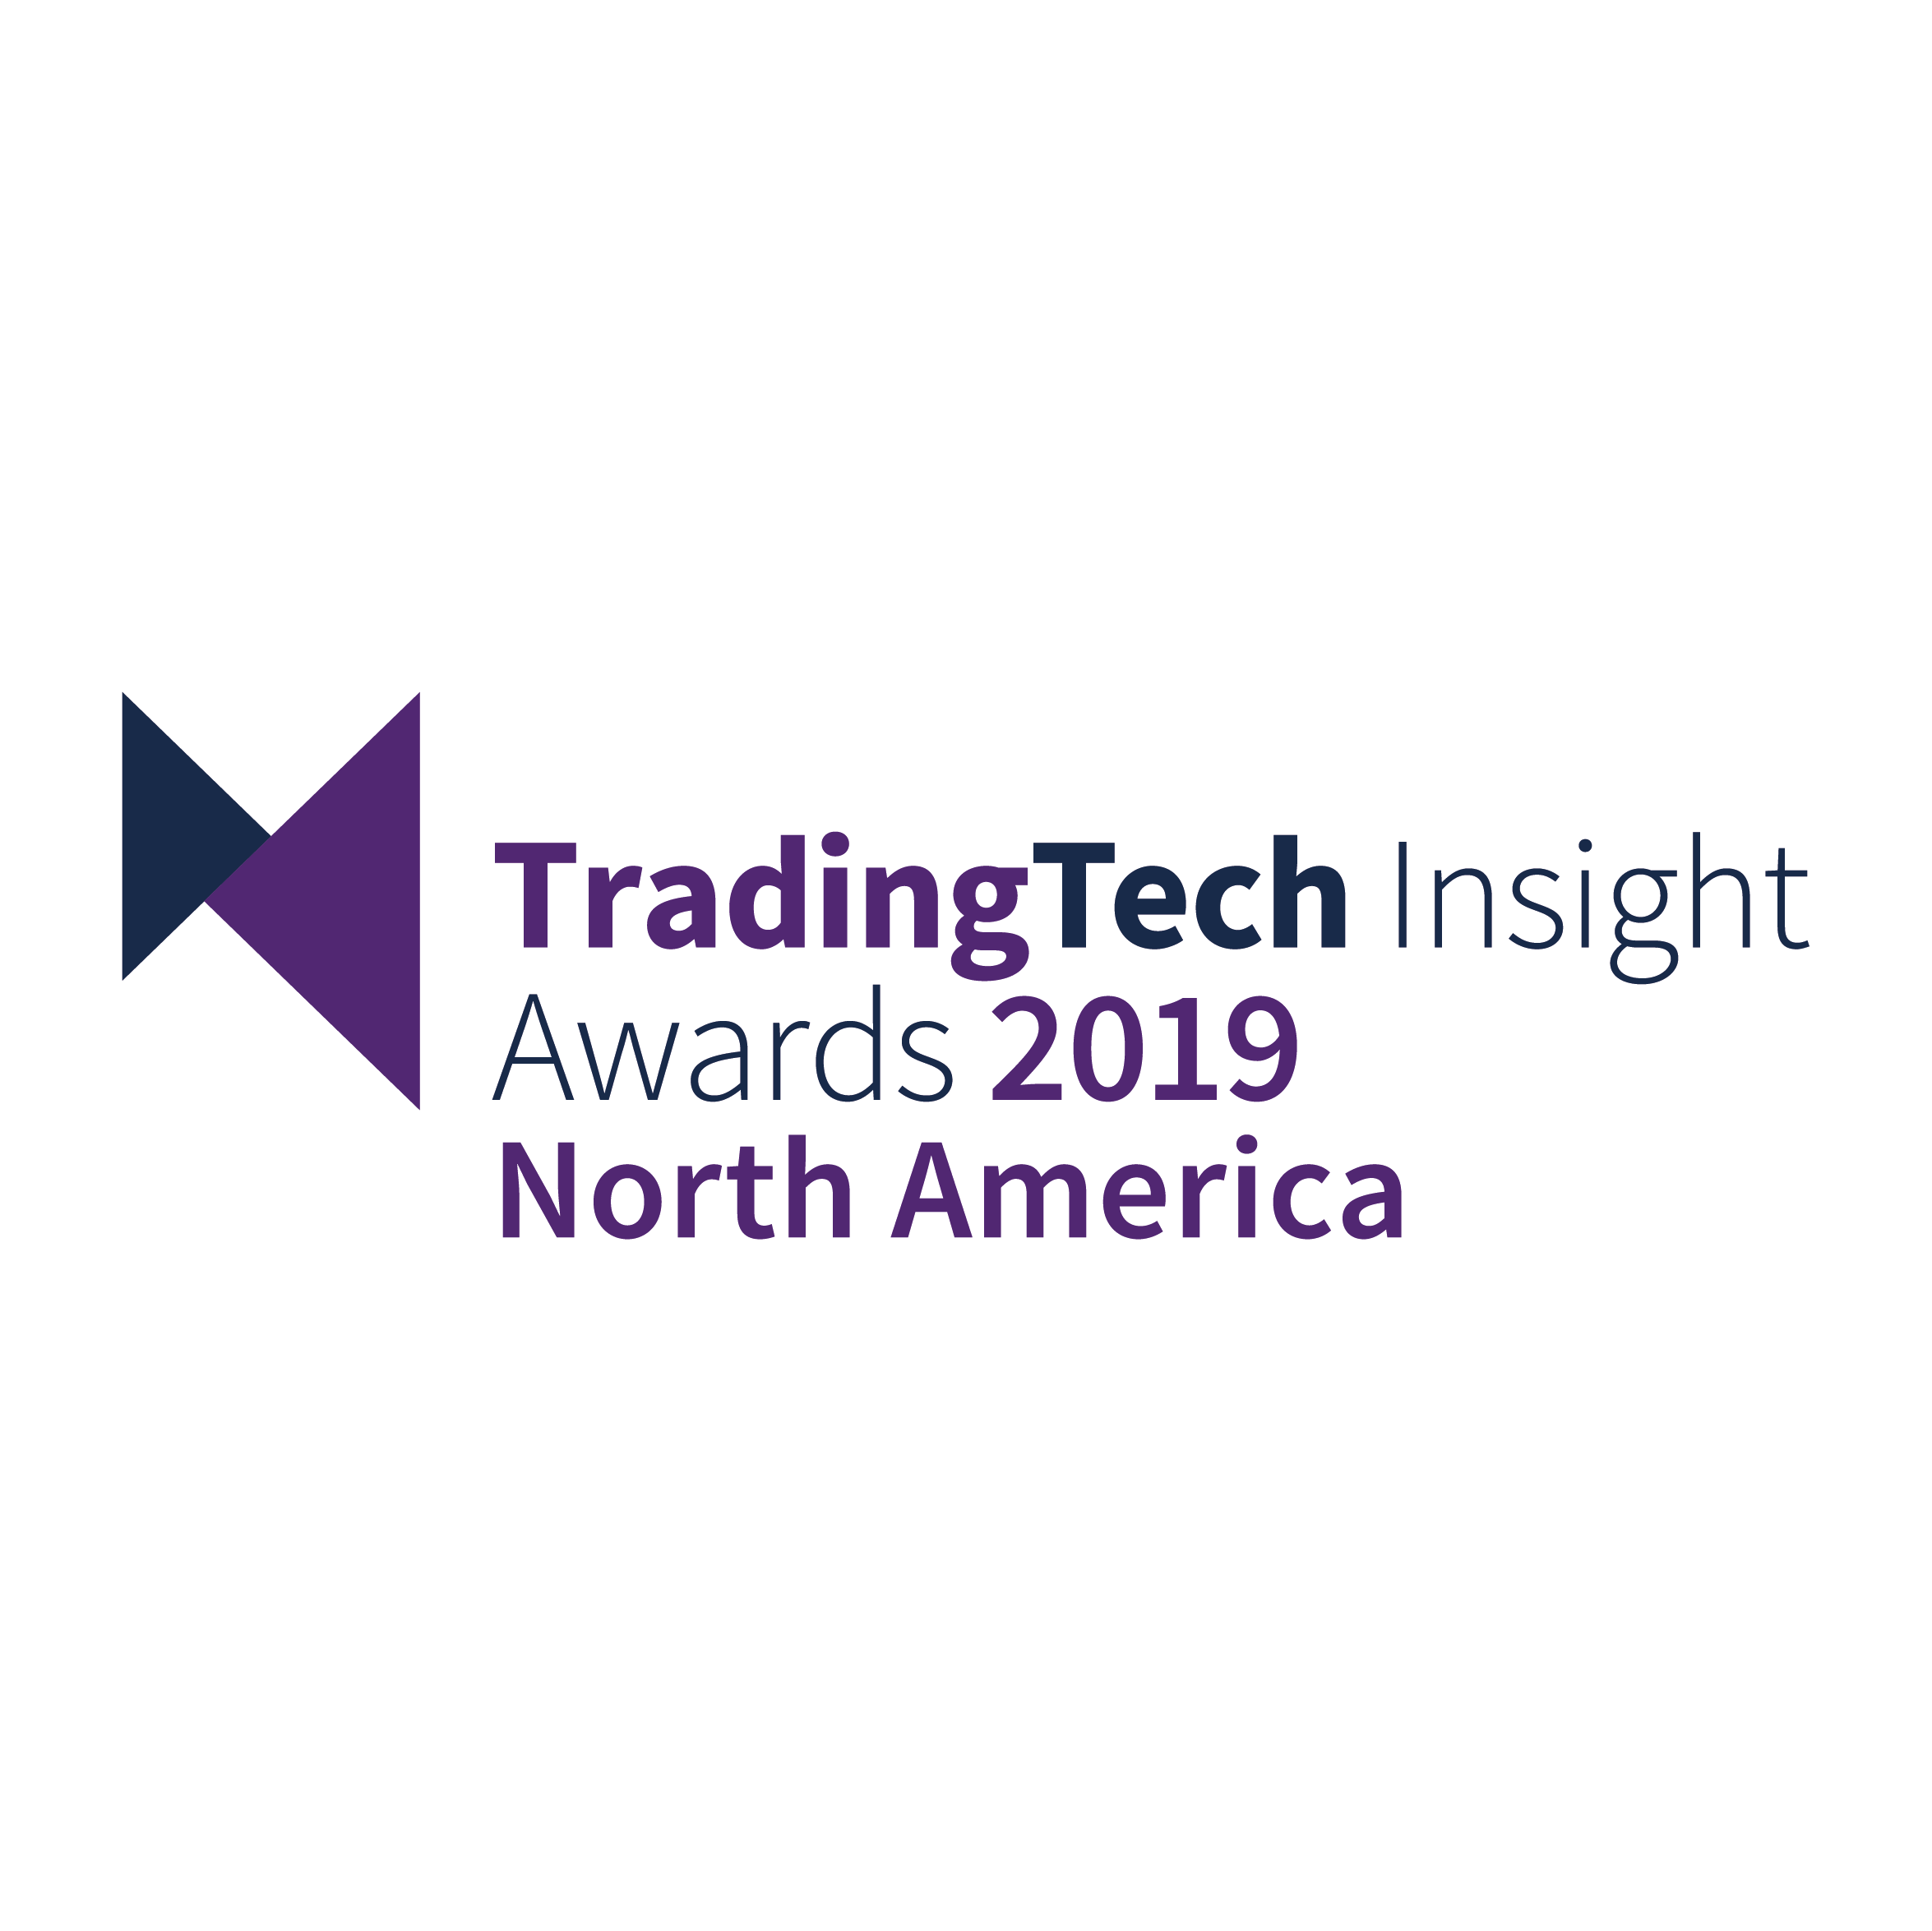 SteelEye TradingTech Insight Awards